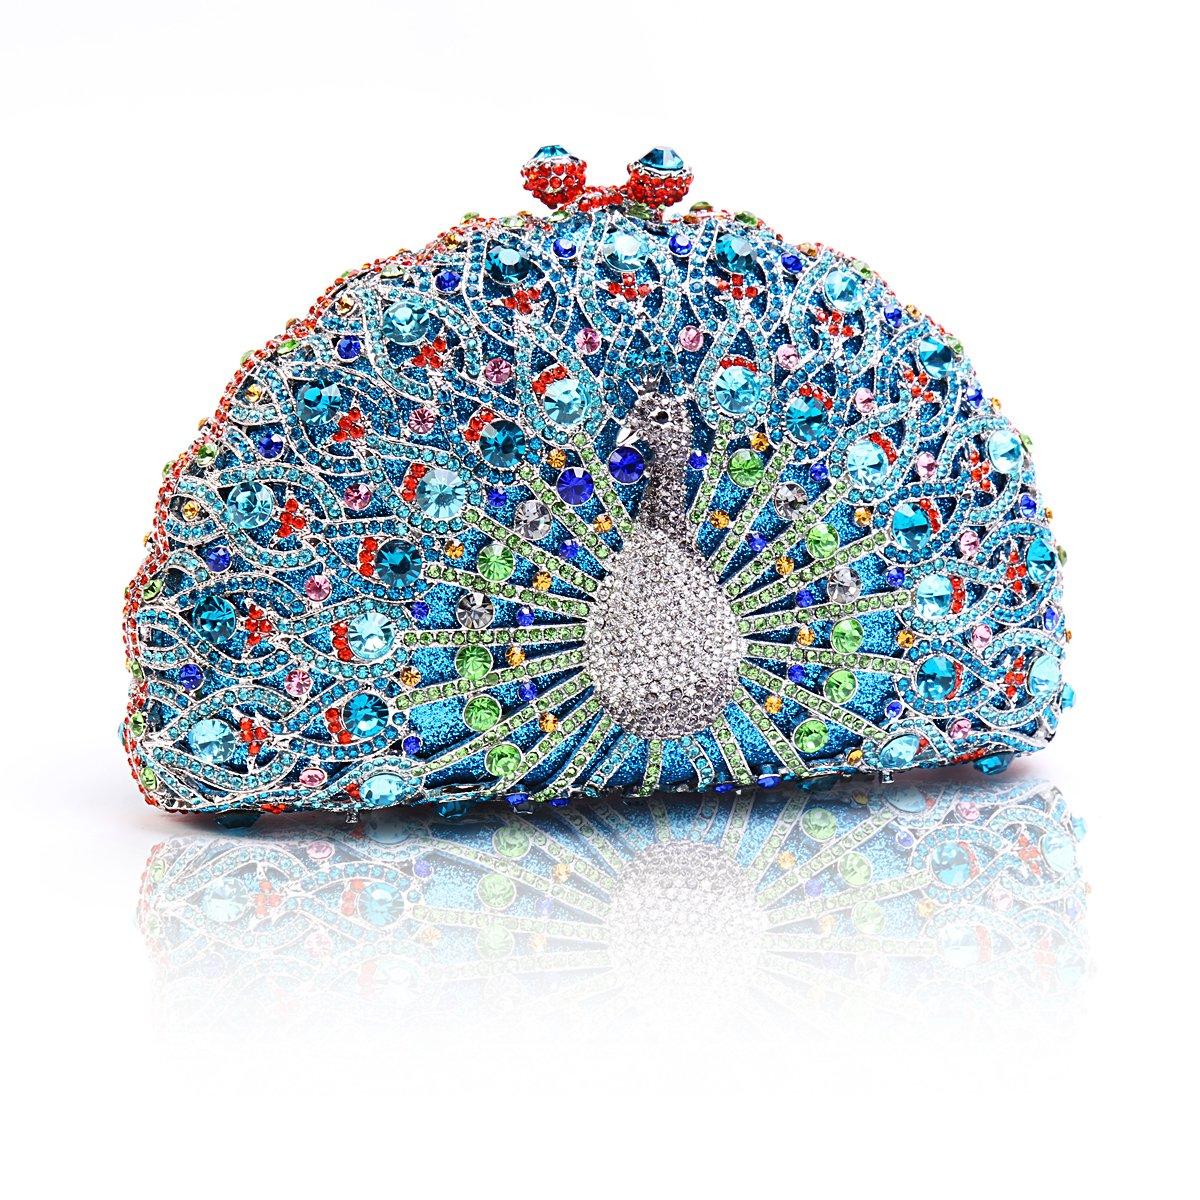 Damara Womens Half Moon Chic Peacock Crystals Wedding Hardcase Evening Bag,Blue